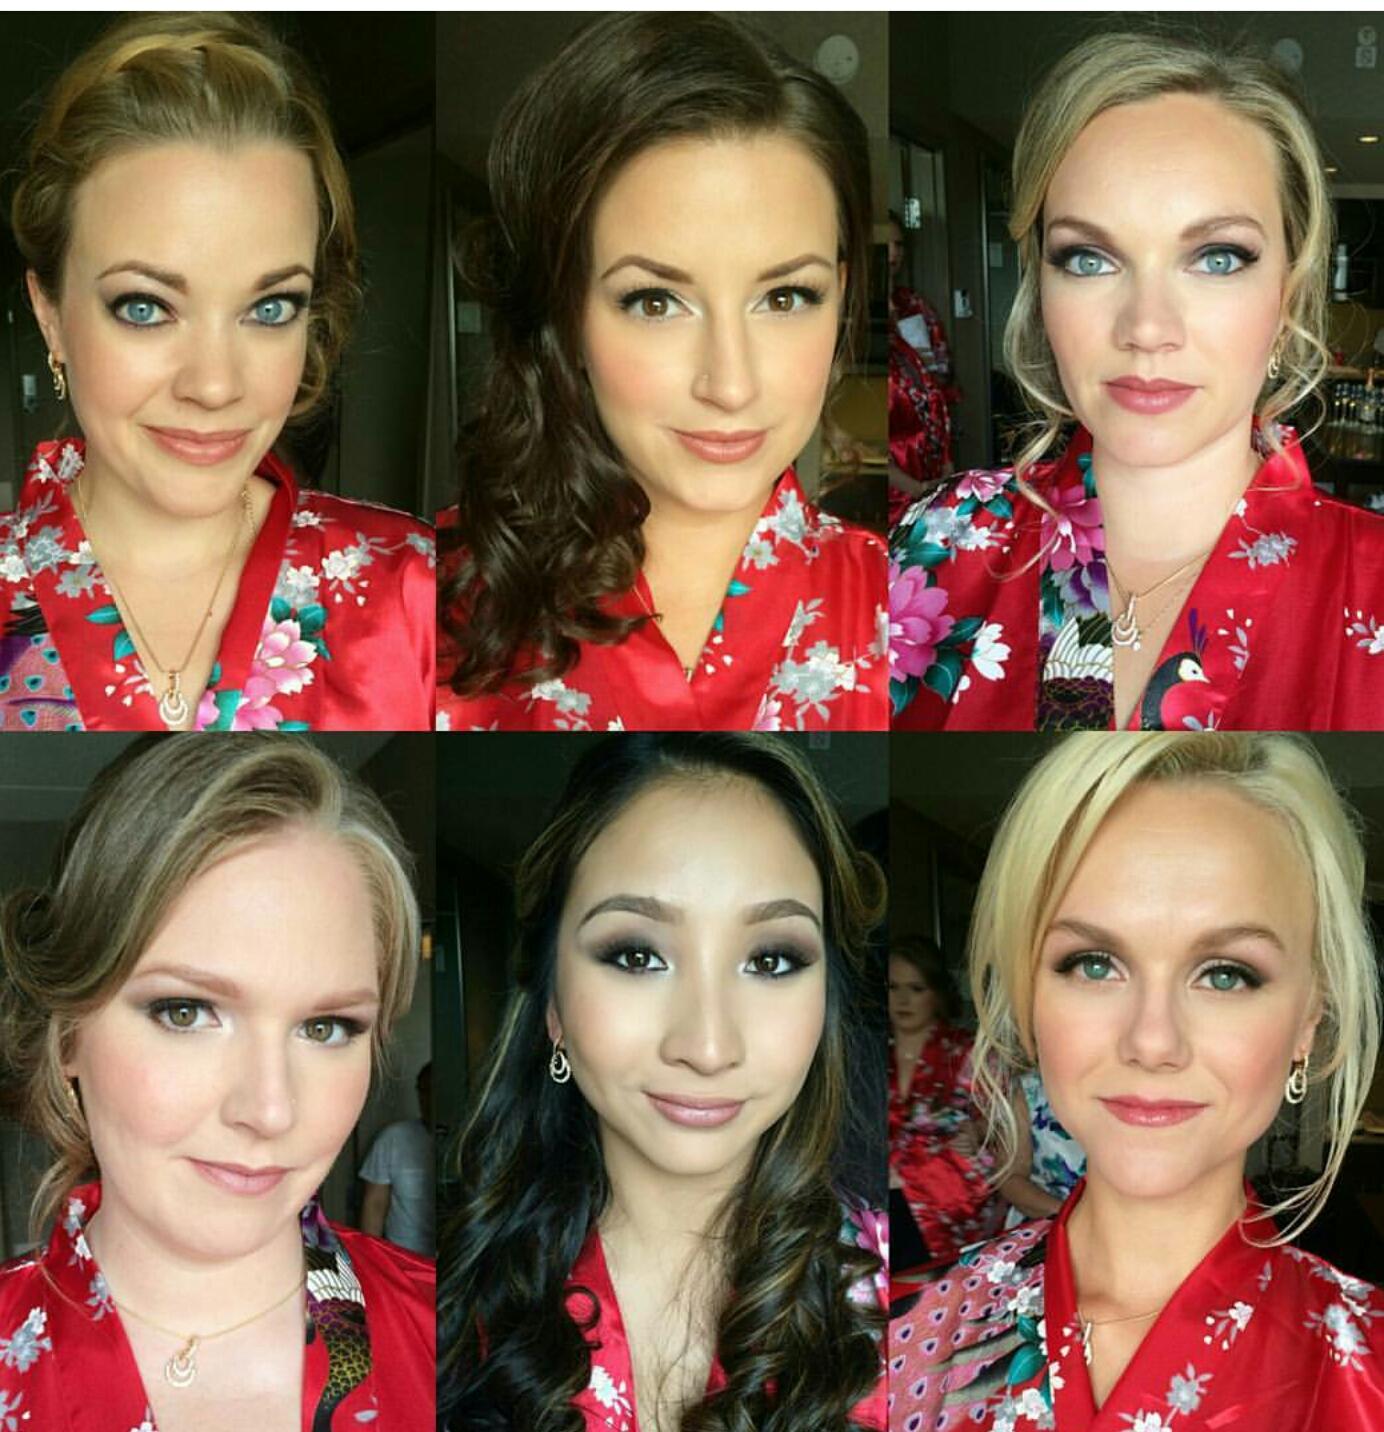 nicole_richards_bridesmaids_makeup_whitby.jpg